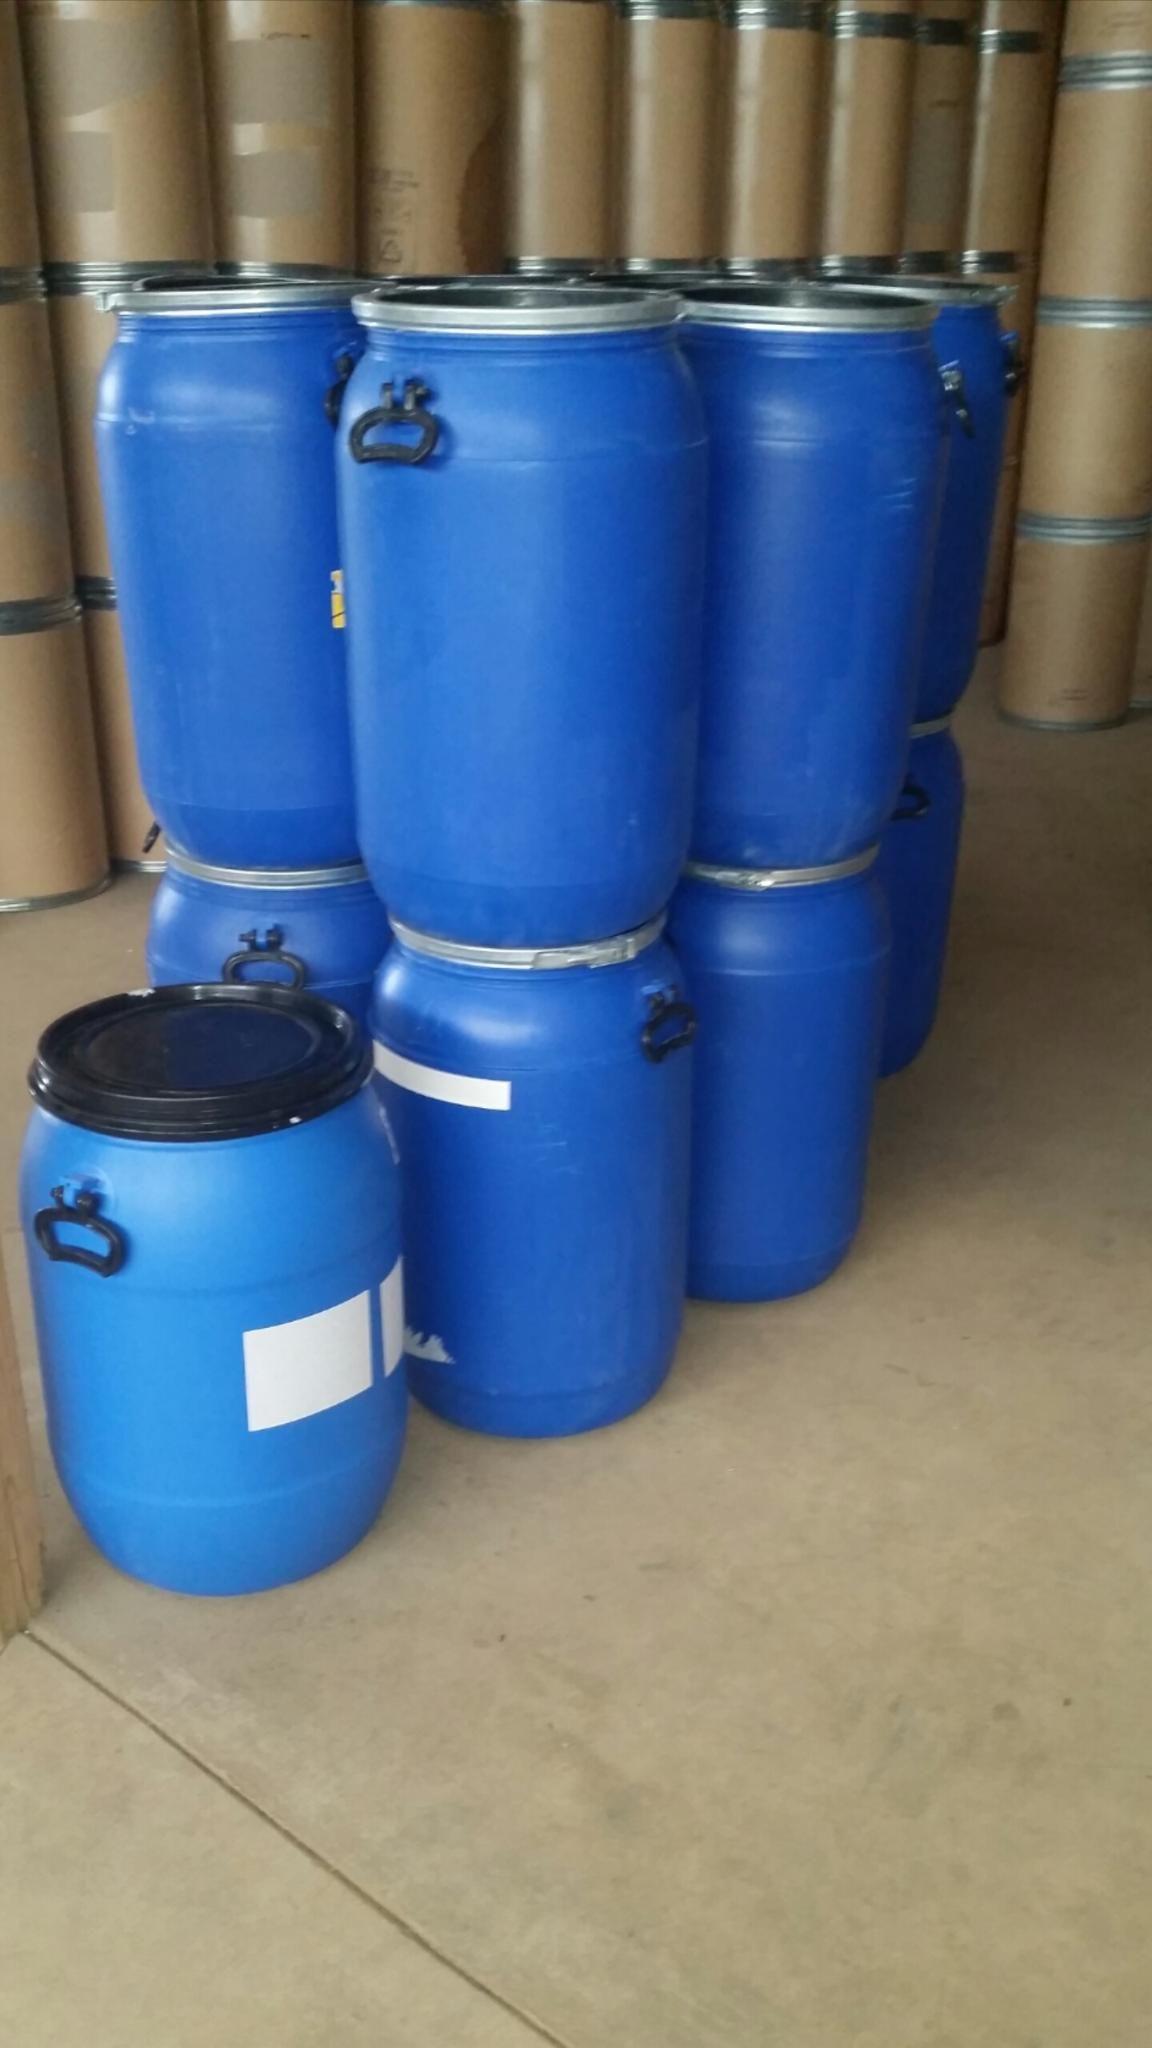 18 Gallon Food Grade Plastic Drum 18 Gallon Plastic